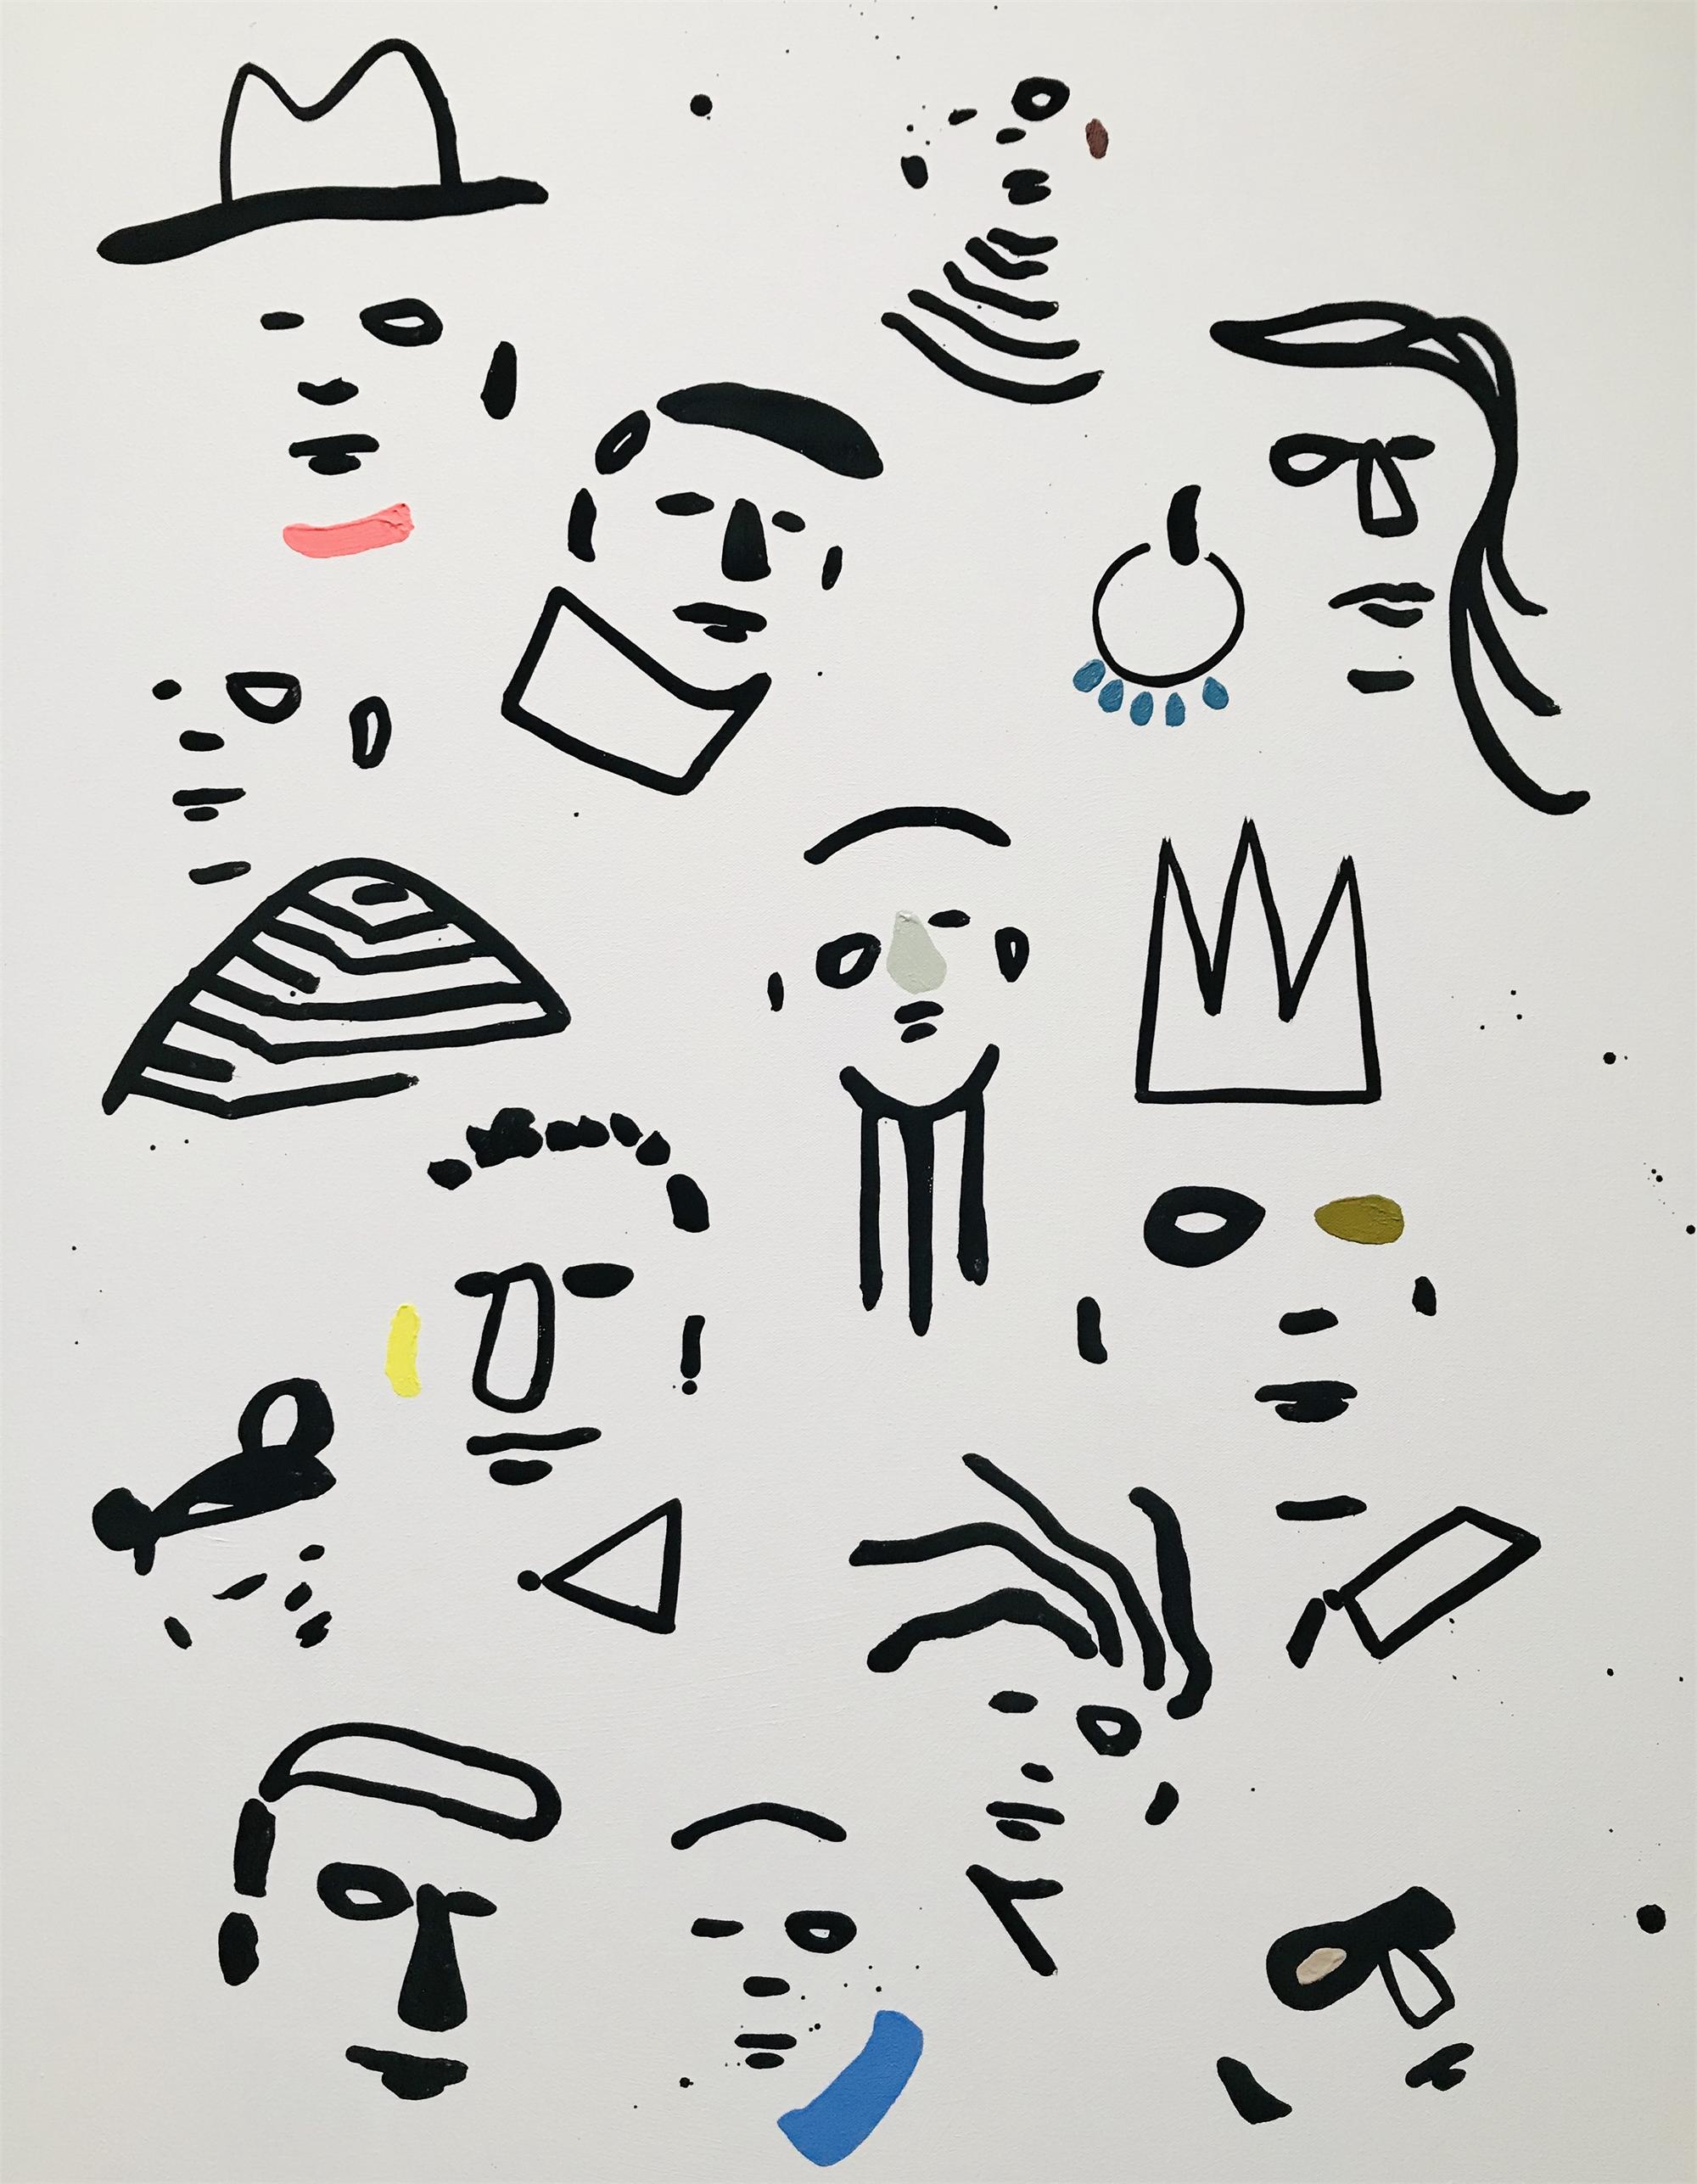 Conga Line by Suzy Lindow